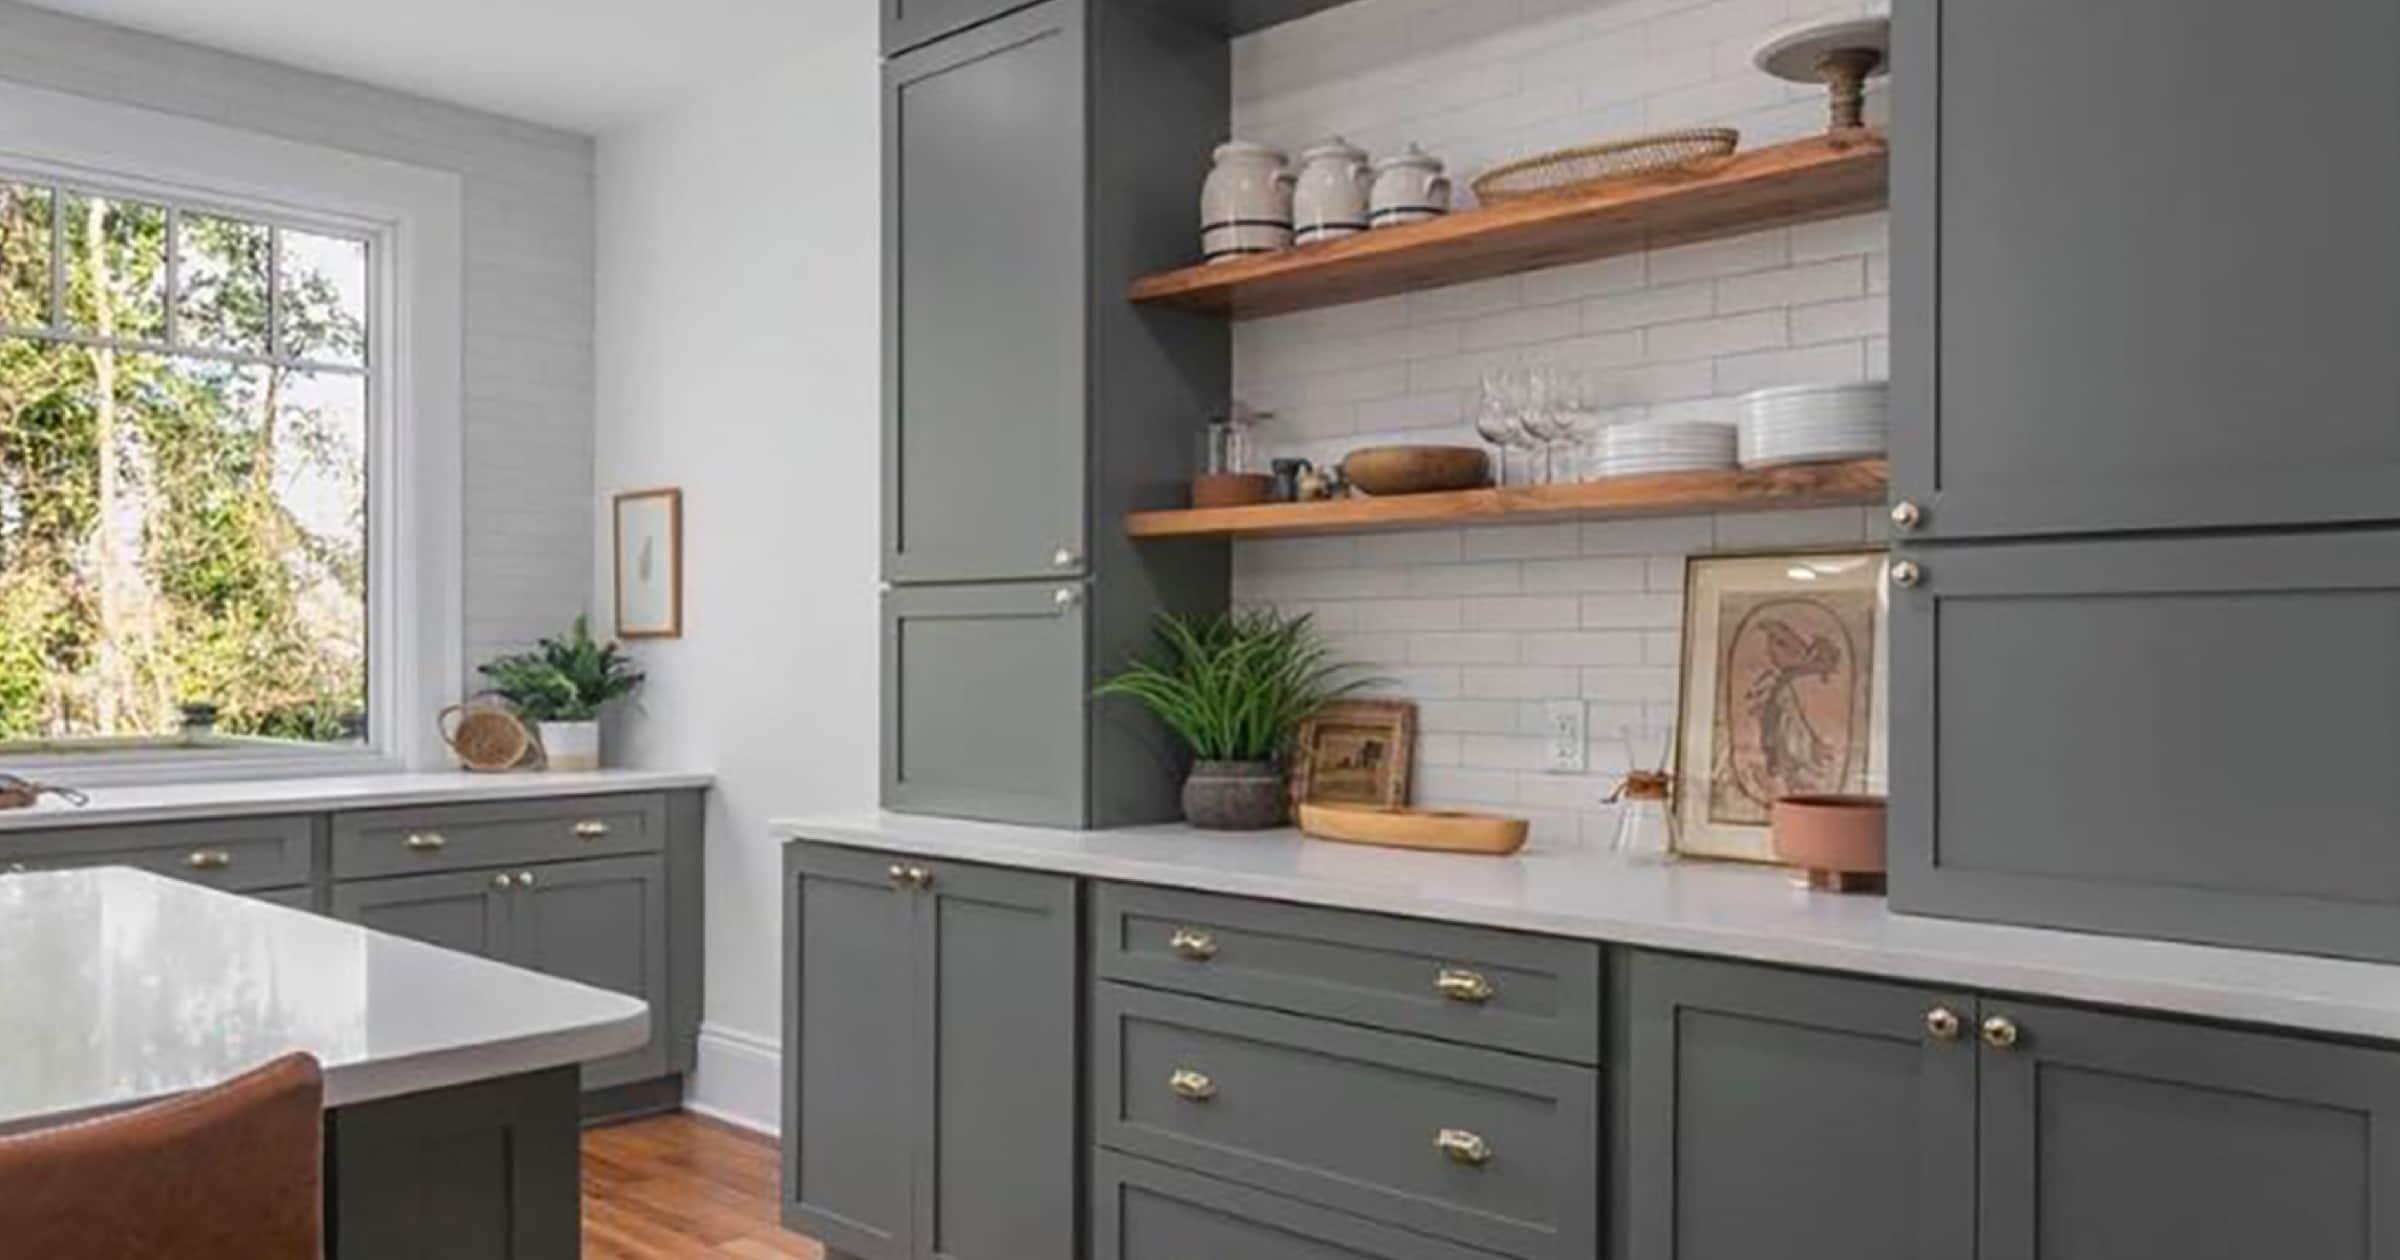 Lowe's Kitchen Design Tool